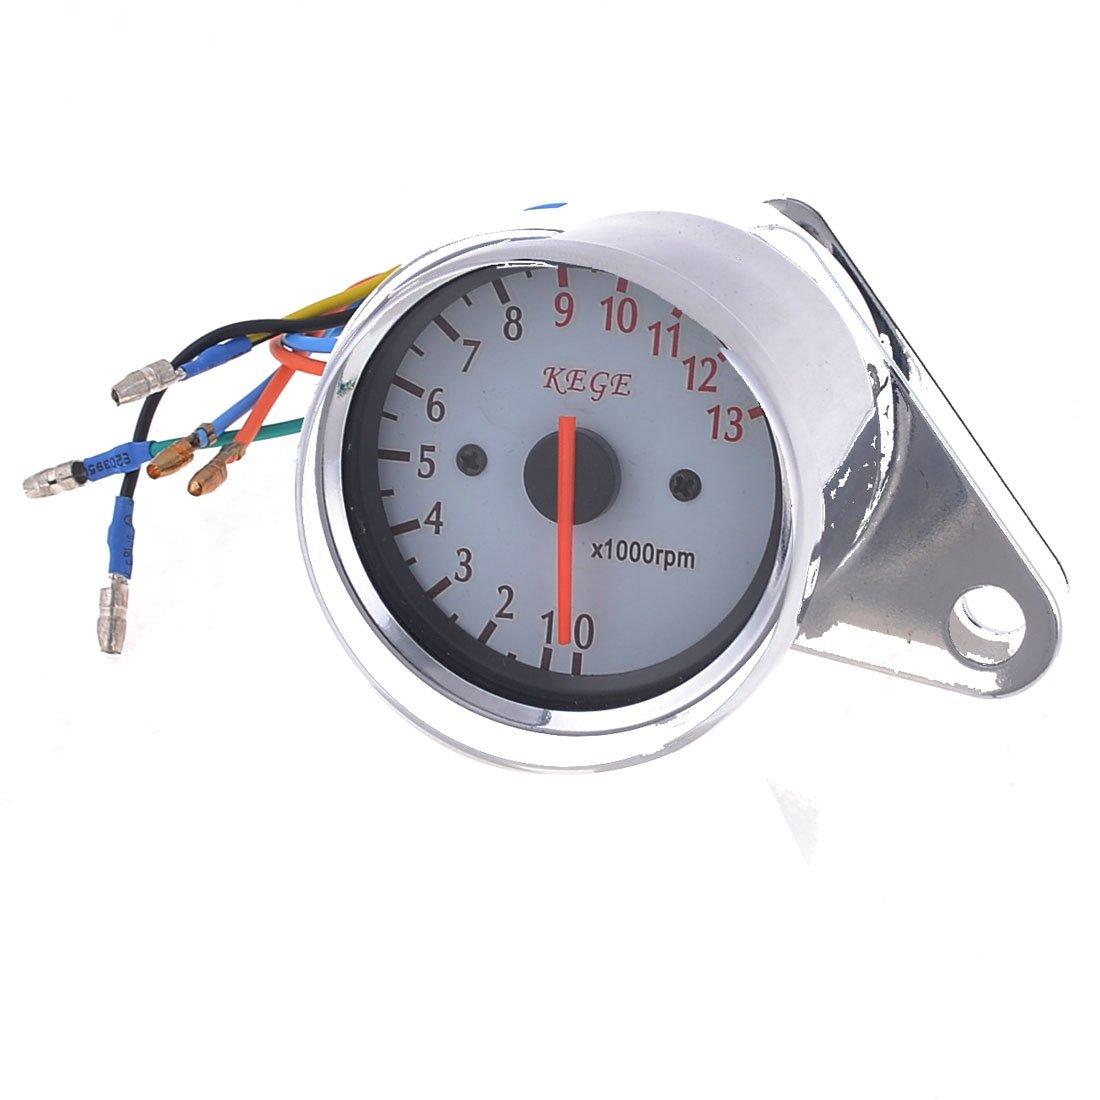 uxcell Car Motorcycle Mechnical 0-13000RPM Tachometer Gauge Meter DC 12V